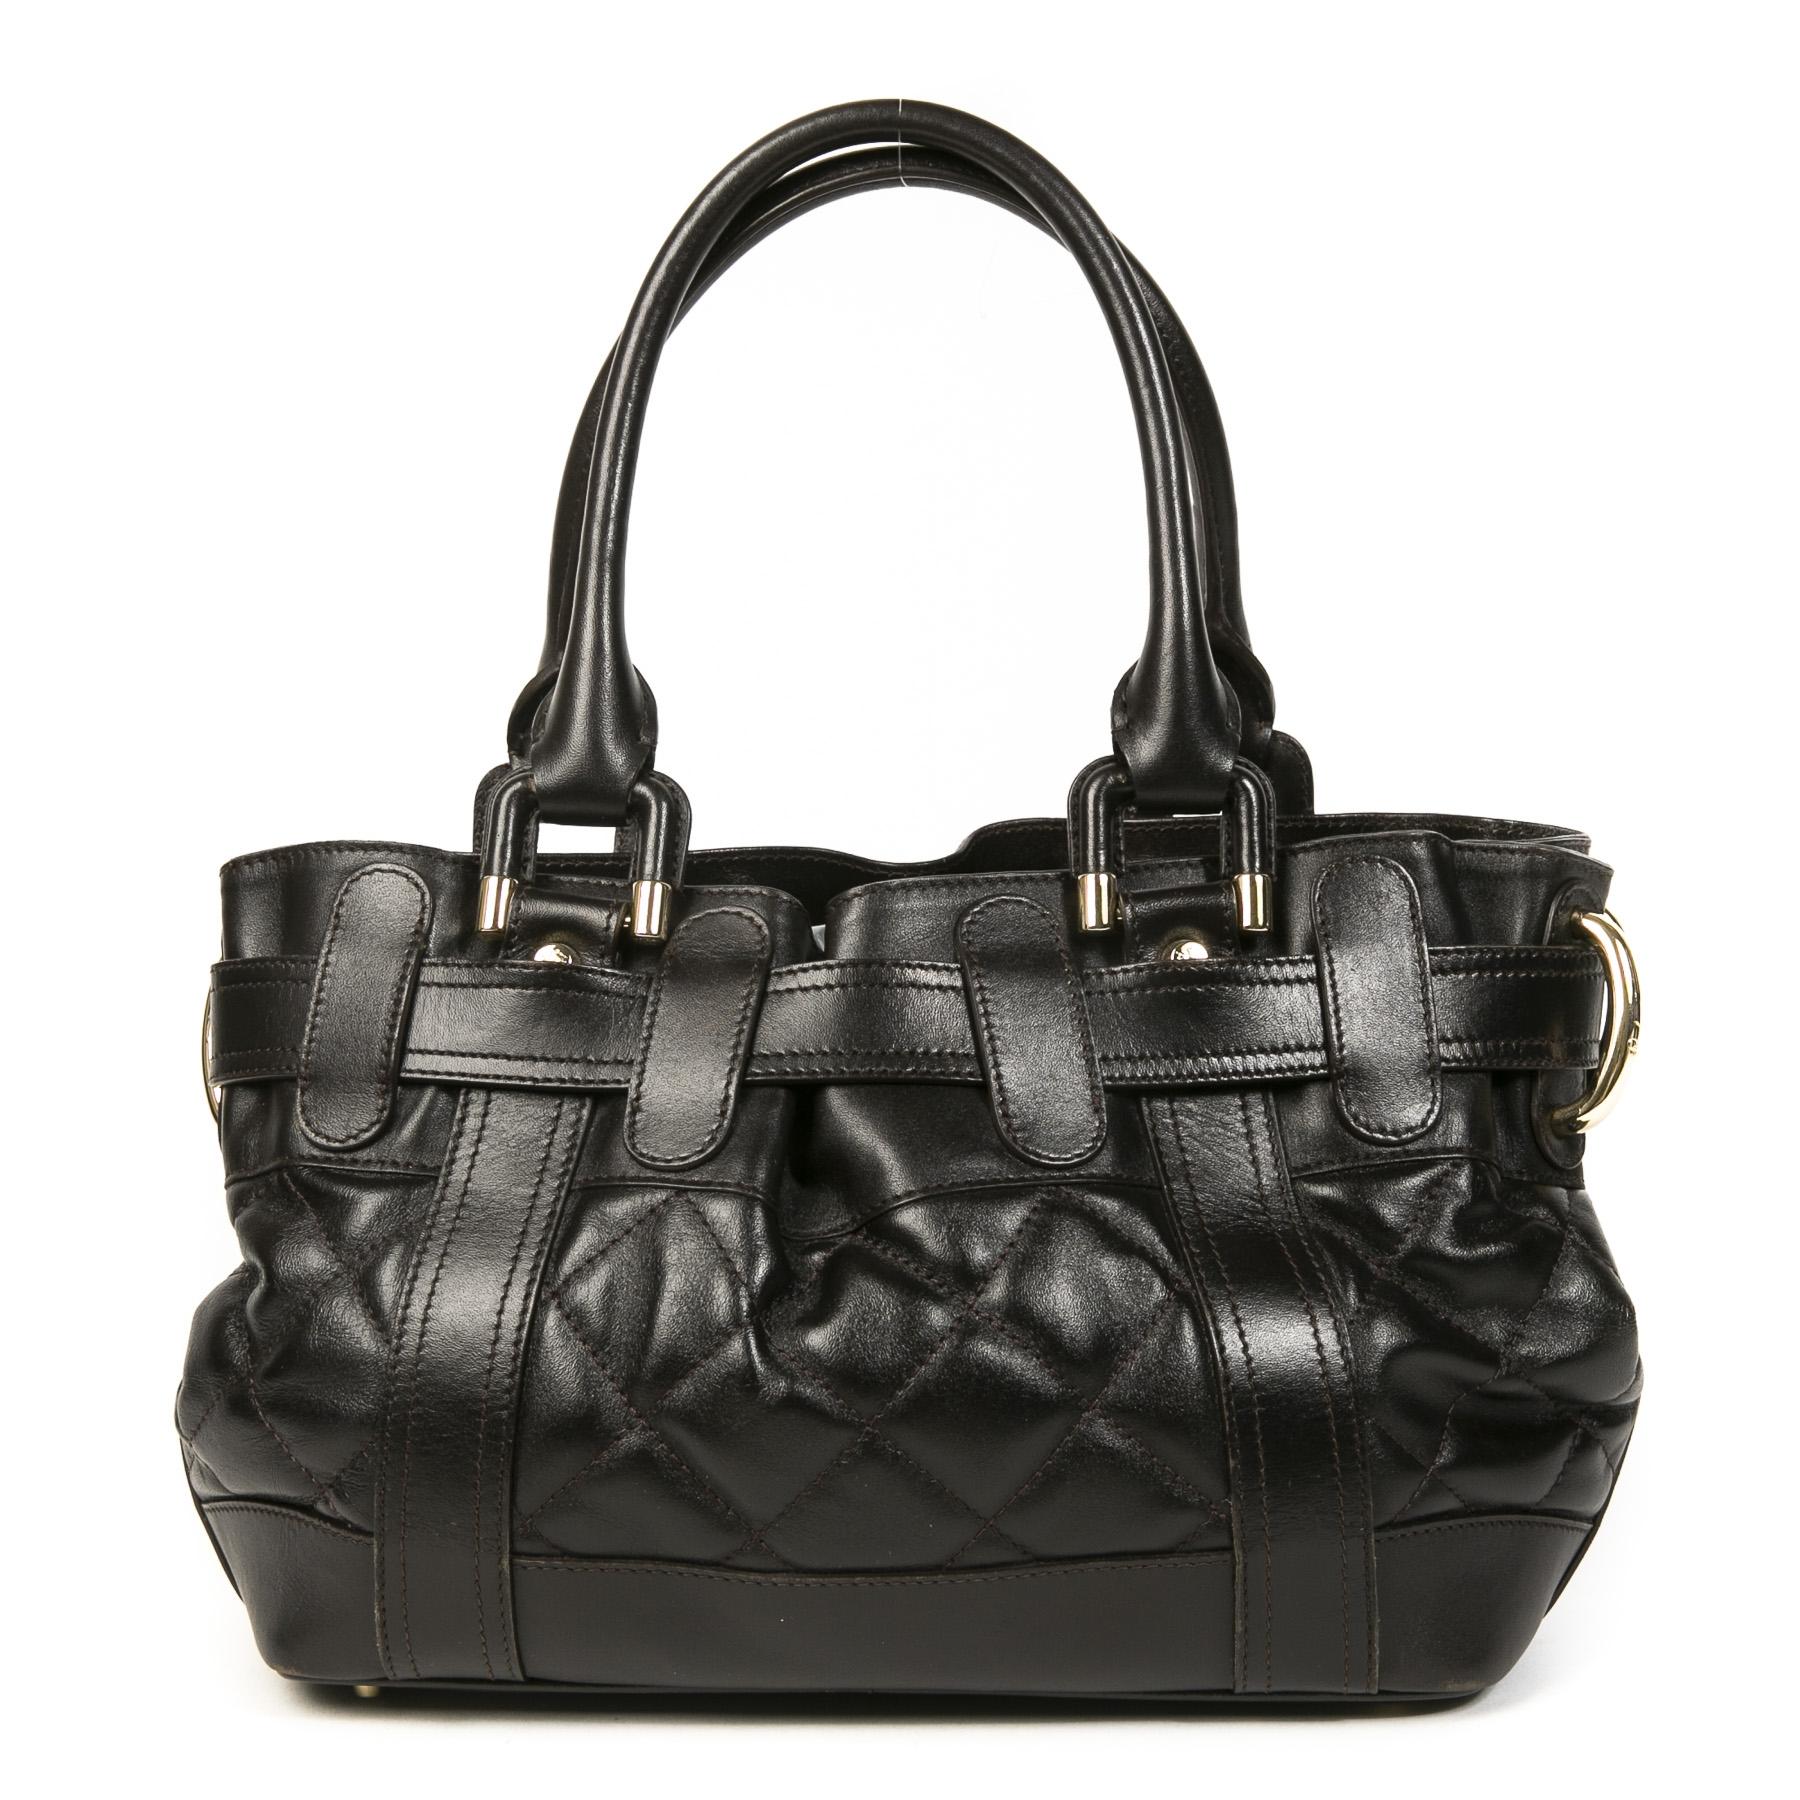 Burberry Prorsum Beaton Dark Brown Leather Shoulder Bag